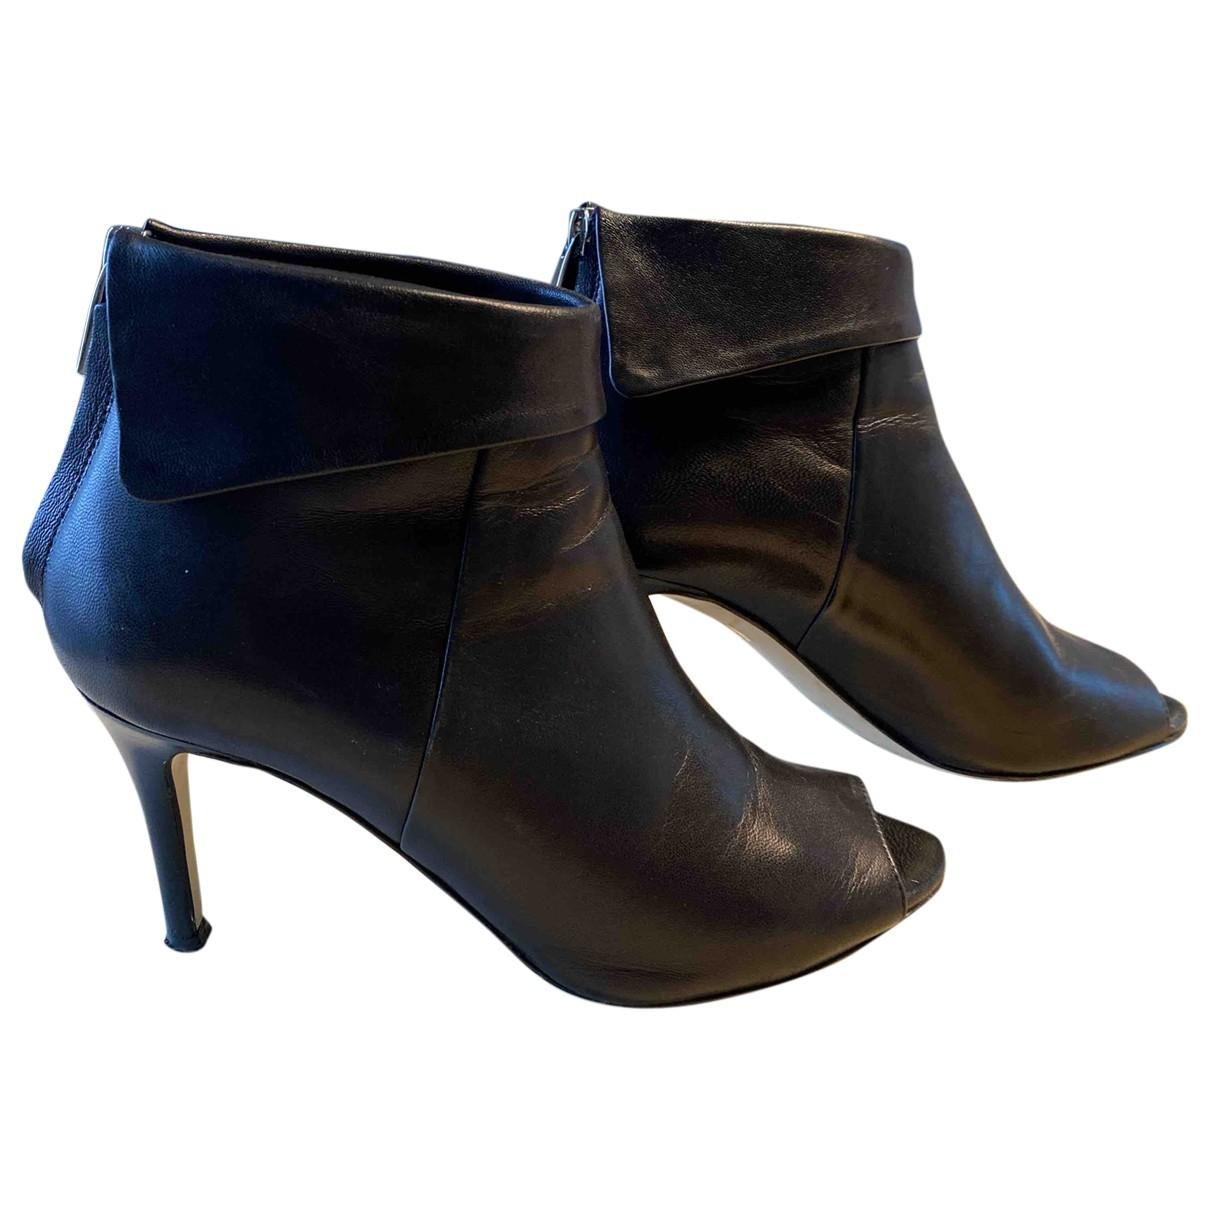 Karen Millen - Boots   pour femme en cuir - noir